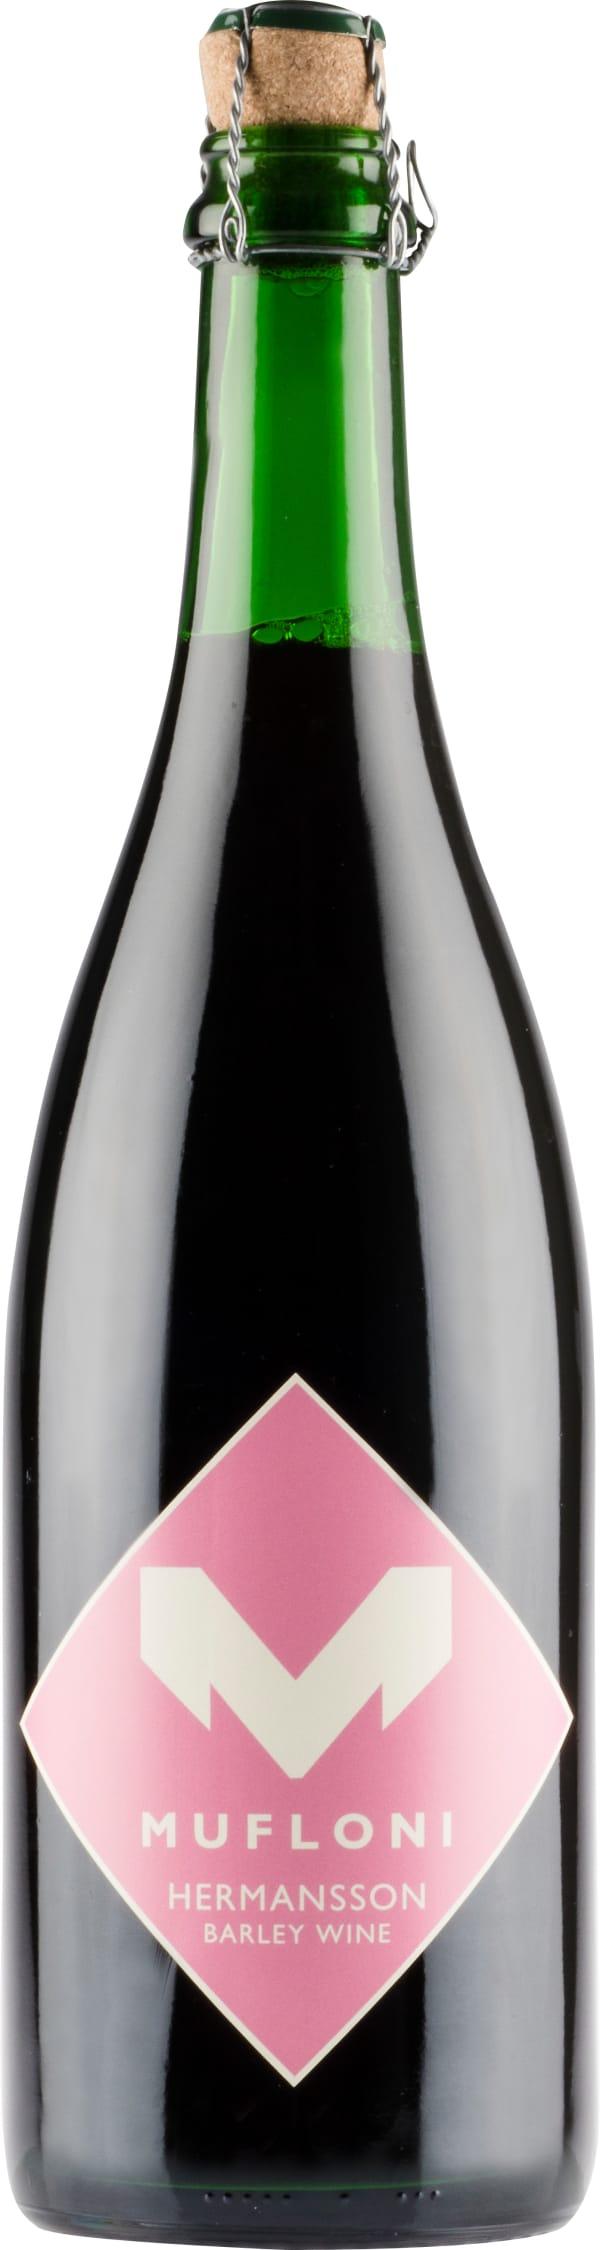 Mufloni Hermansson Barley Wine